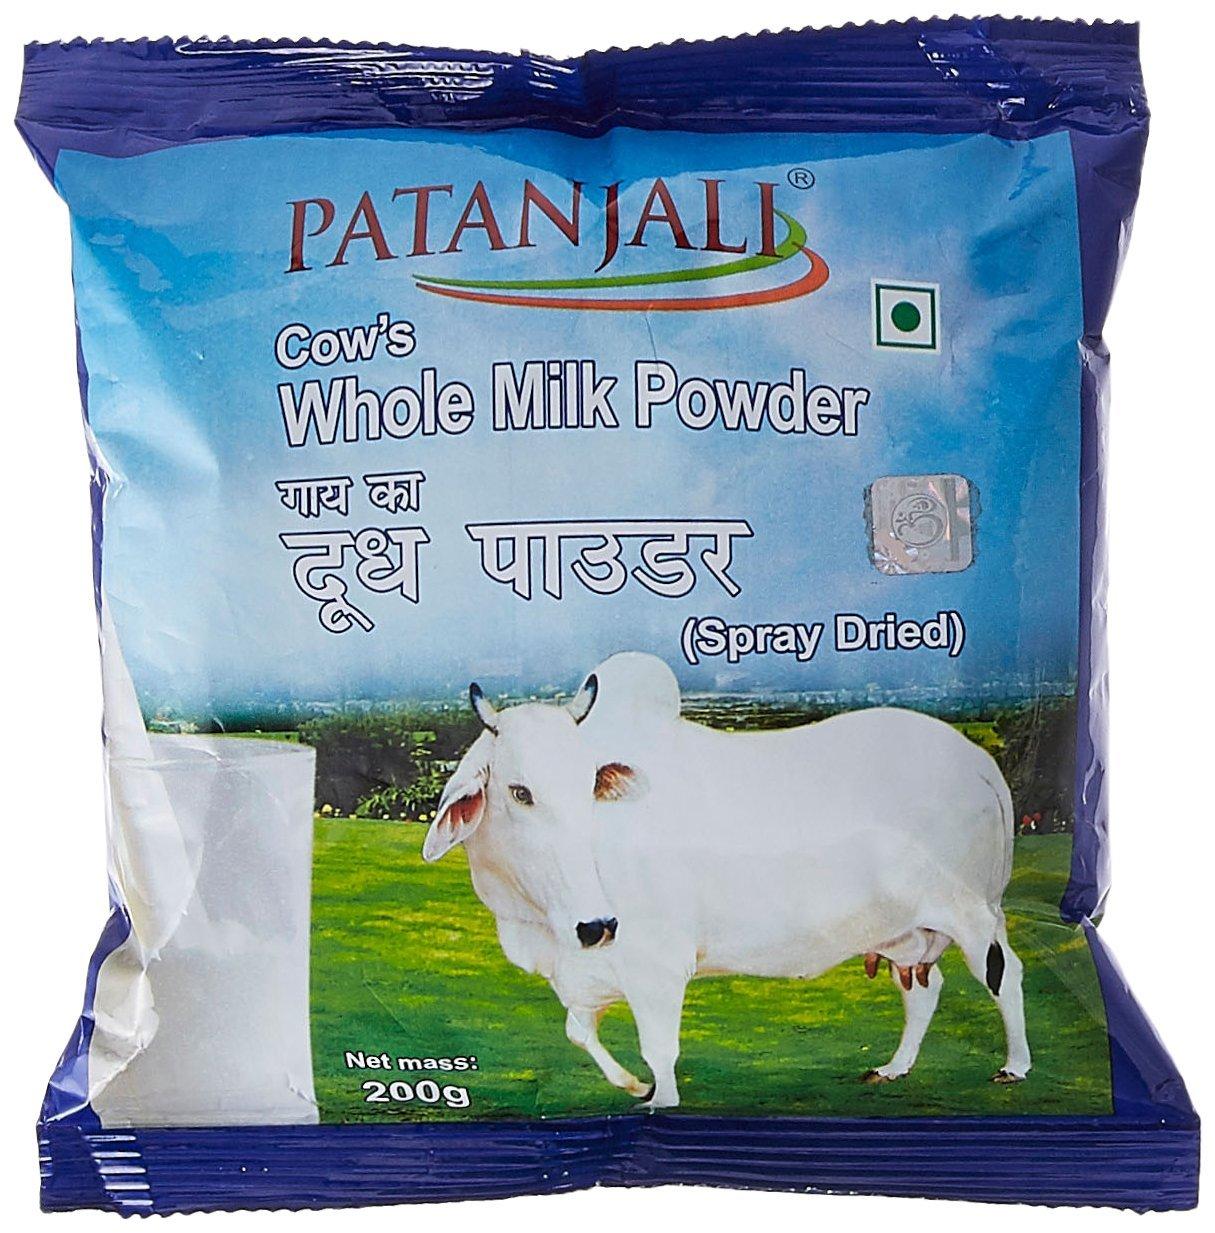 Patanjali Cow's Whole Milk Powder Image